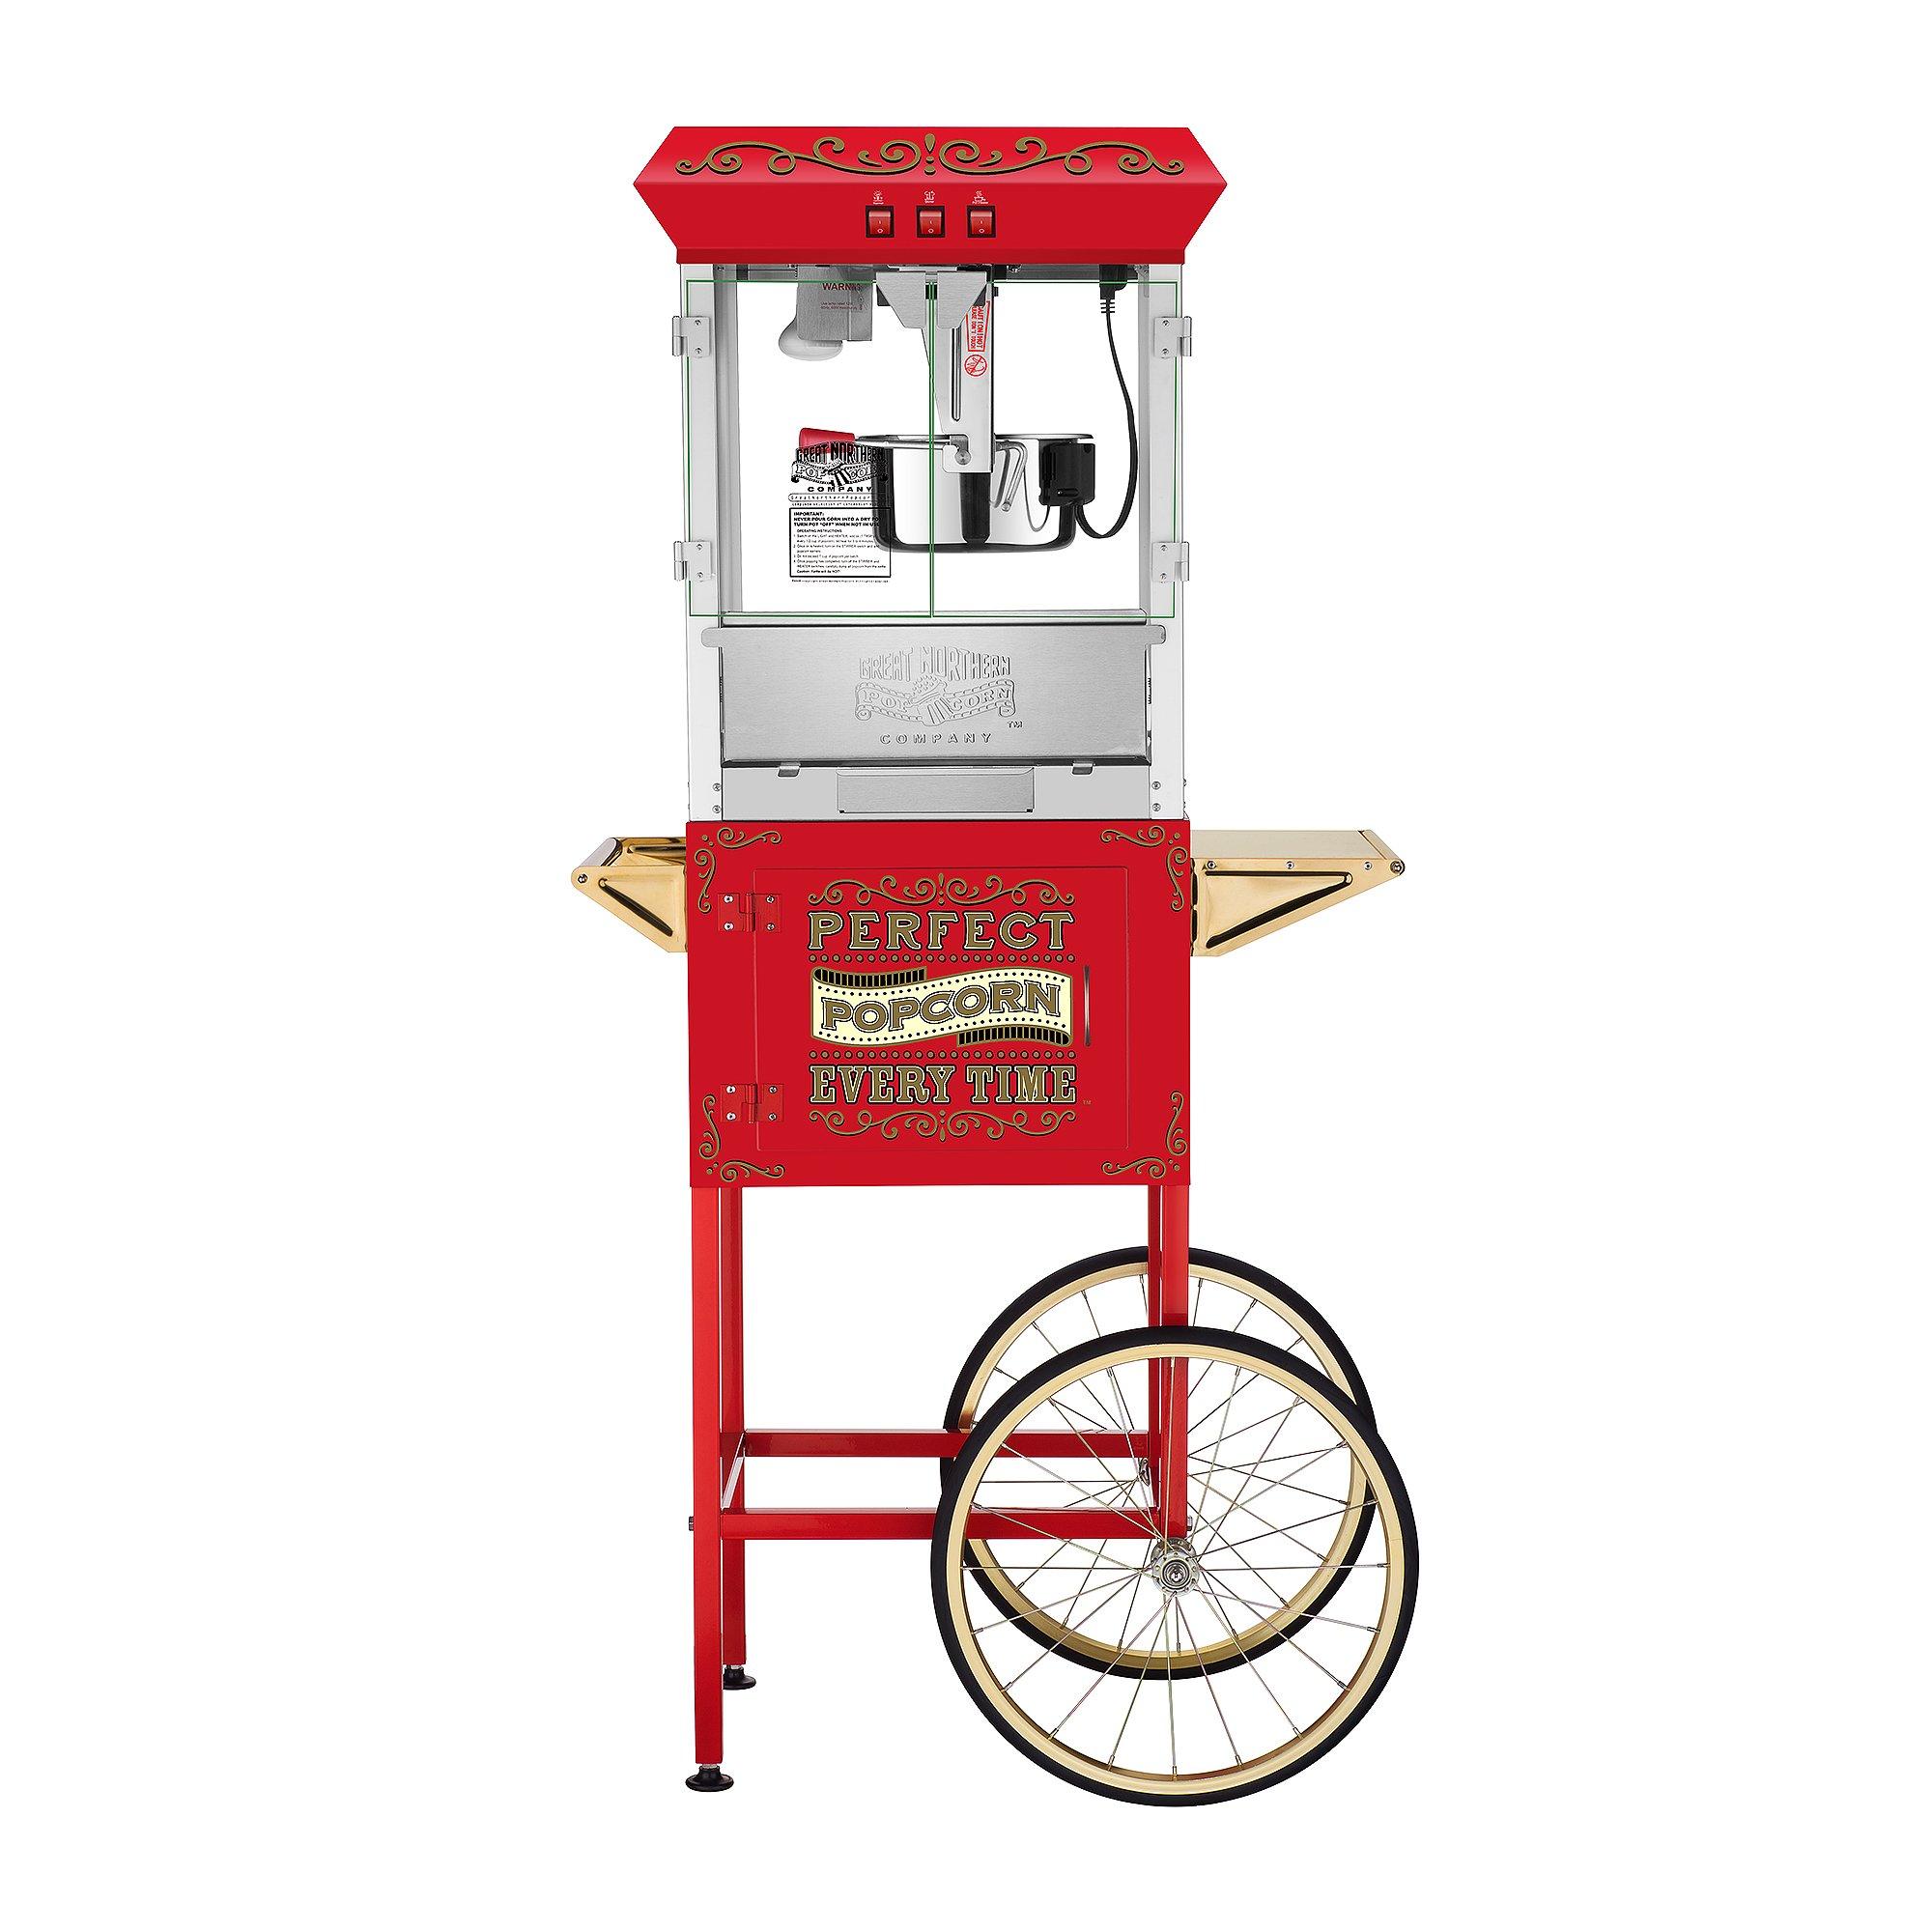 Great Northern Popcorn 5995 10 oz. Perfect Popper Popcorn Machine with Cart - Red by Great Northern Popcorn Company